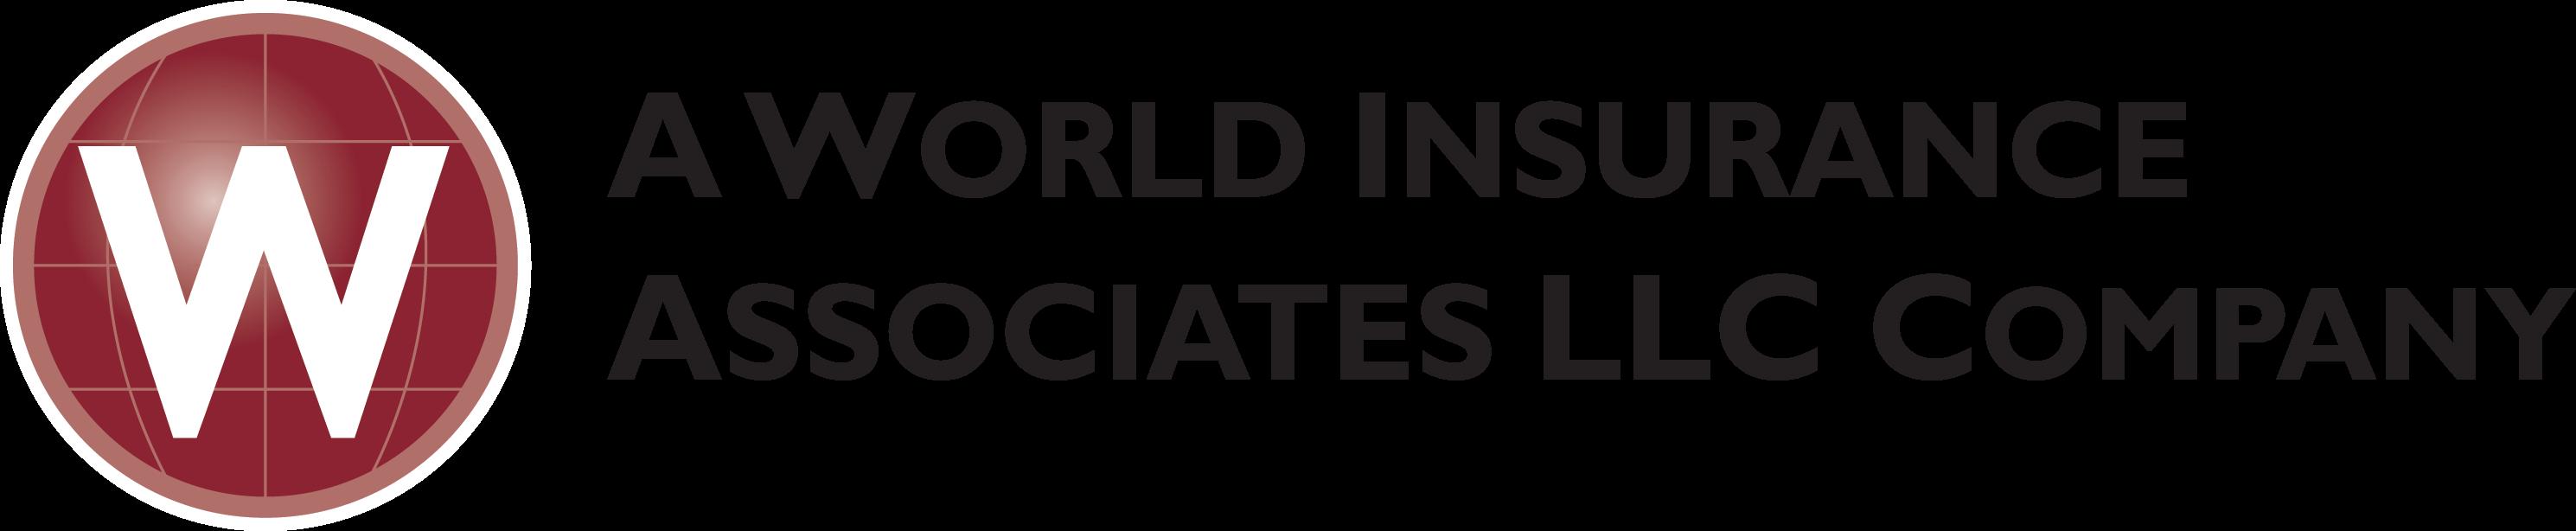 WorldInsurance_W_Tagline_PMS202.png